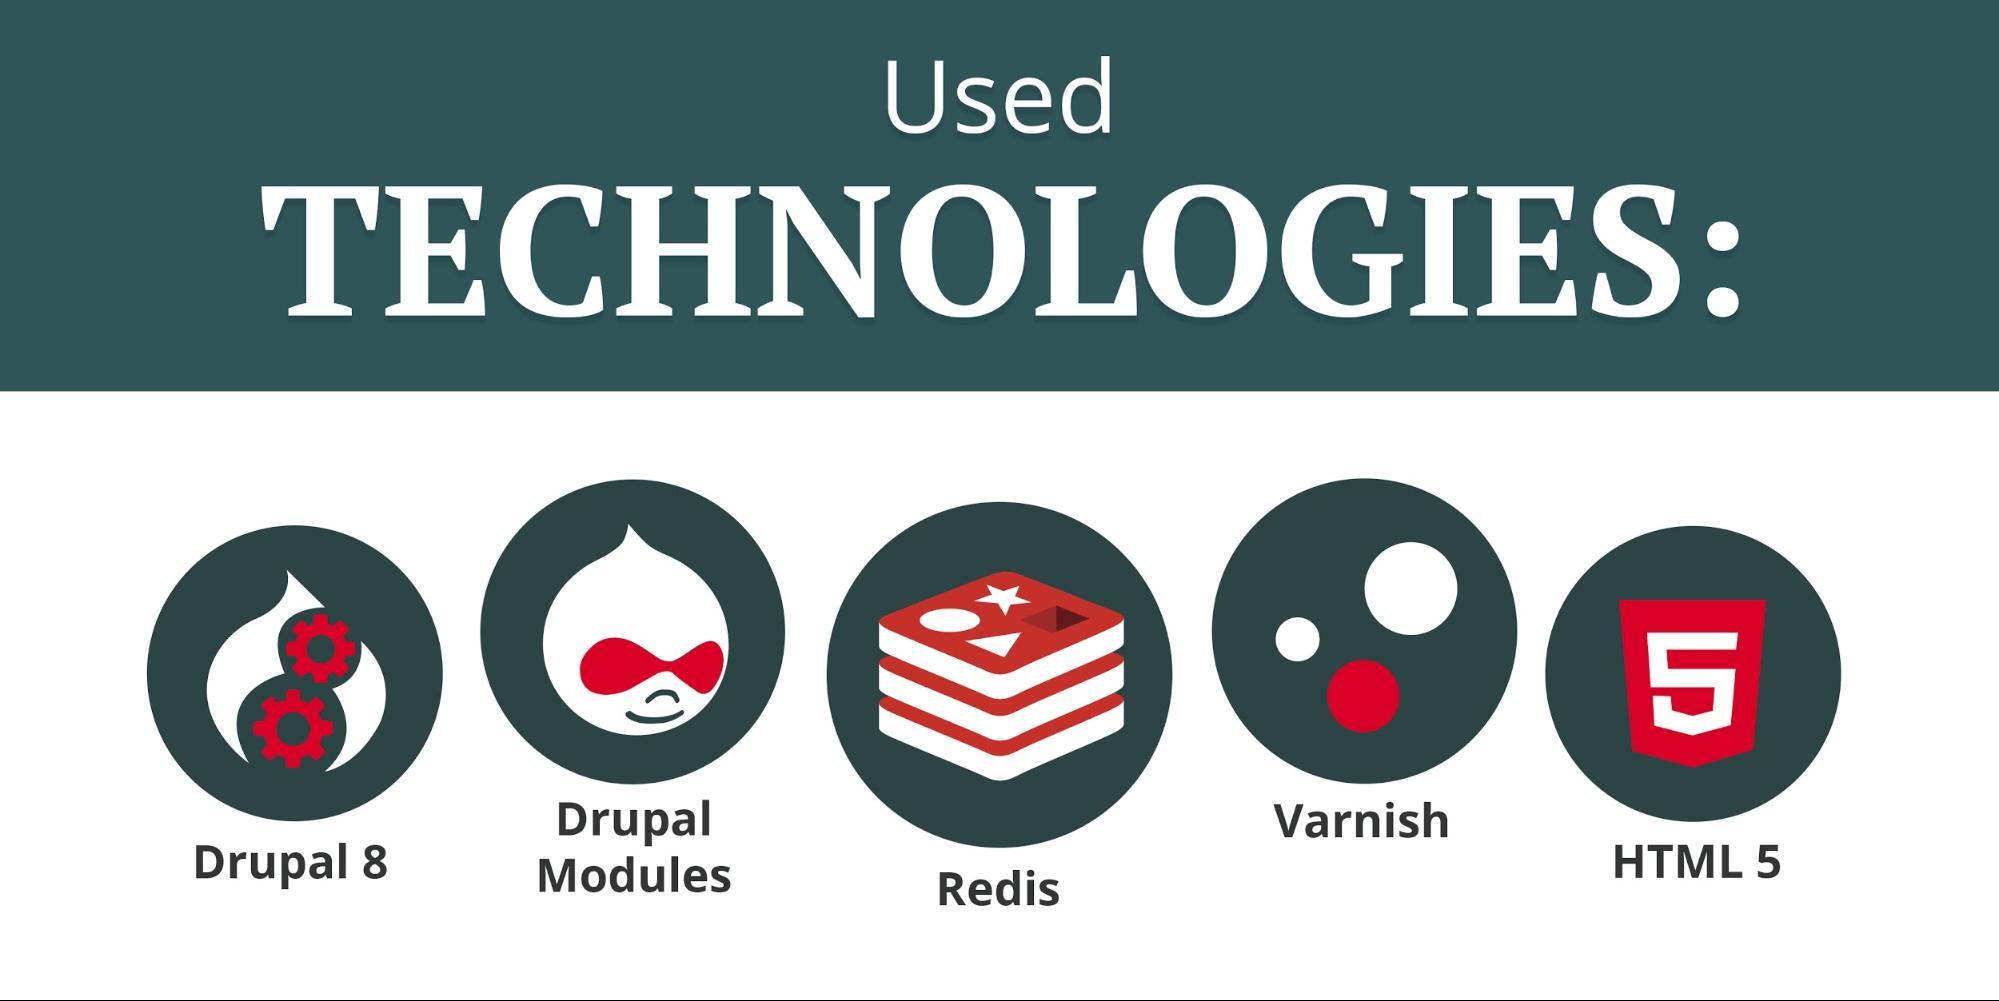 USED TECHNOLOGIES: Drupal 8, Drupal Modules, Redis, Varnish, HTML 5